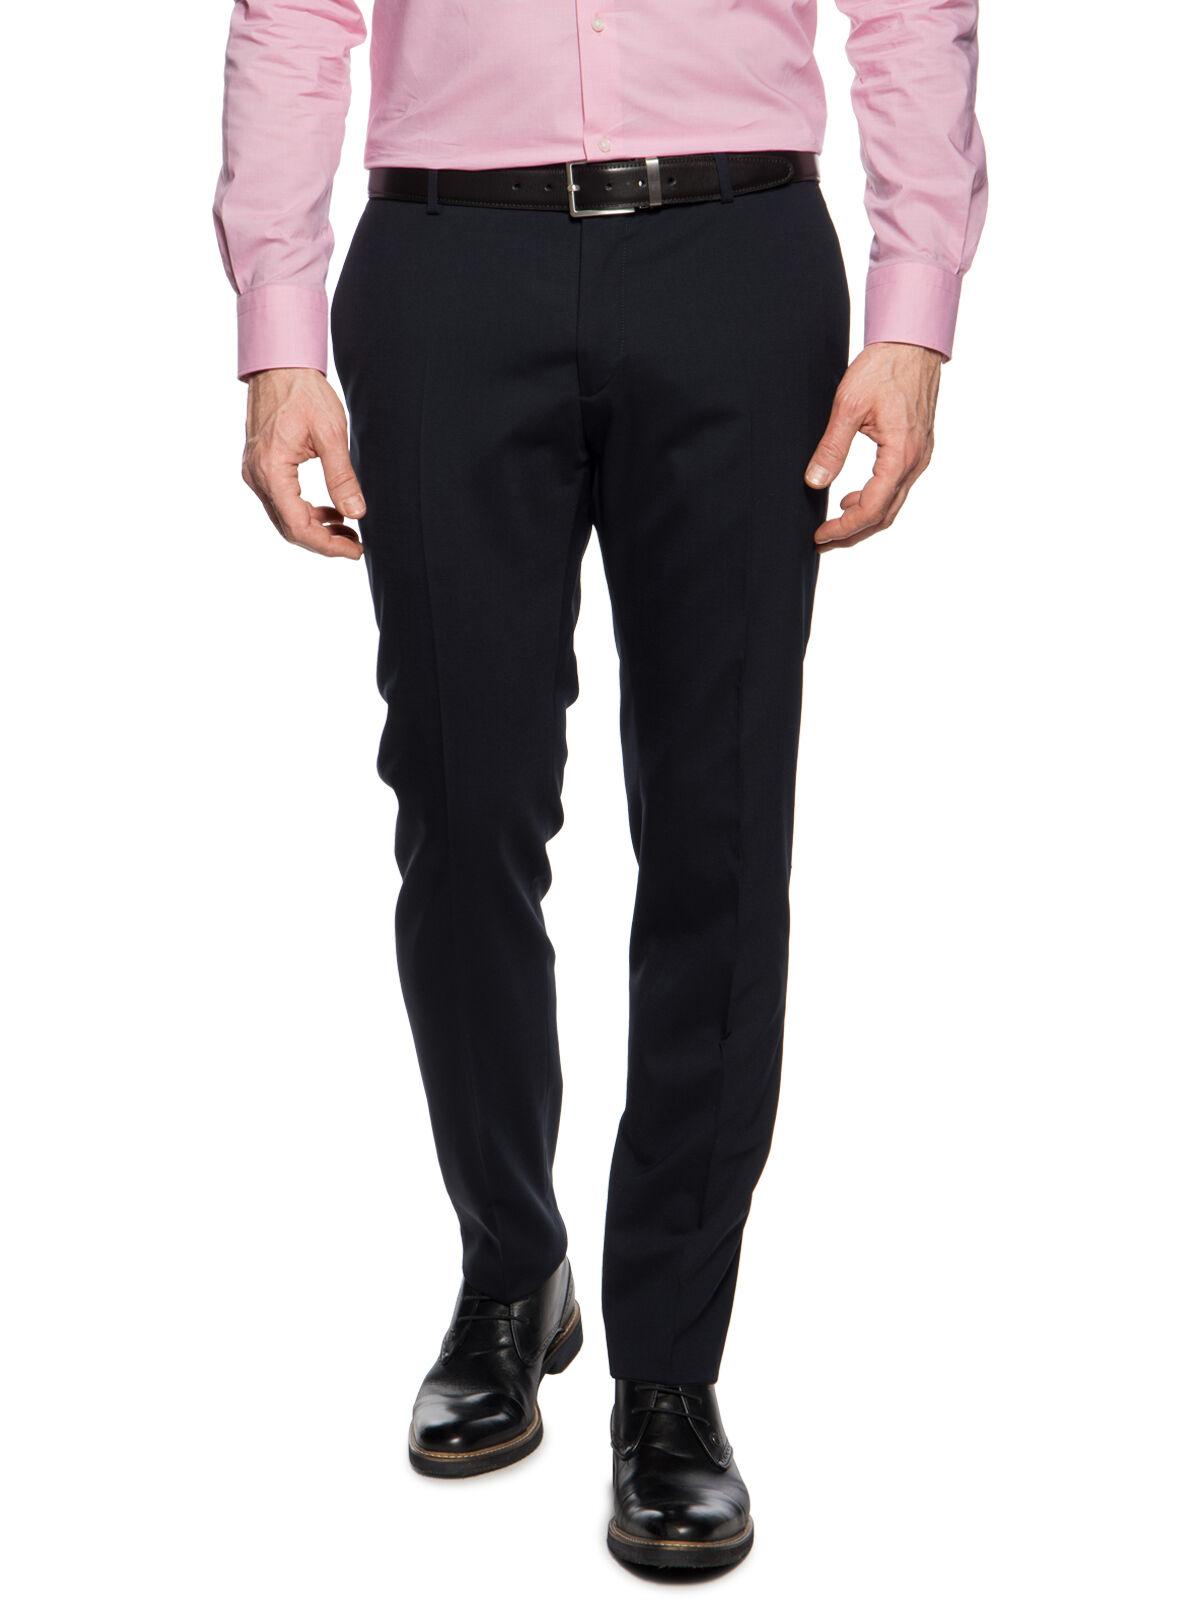 Pantalon combinable Paris Fitted